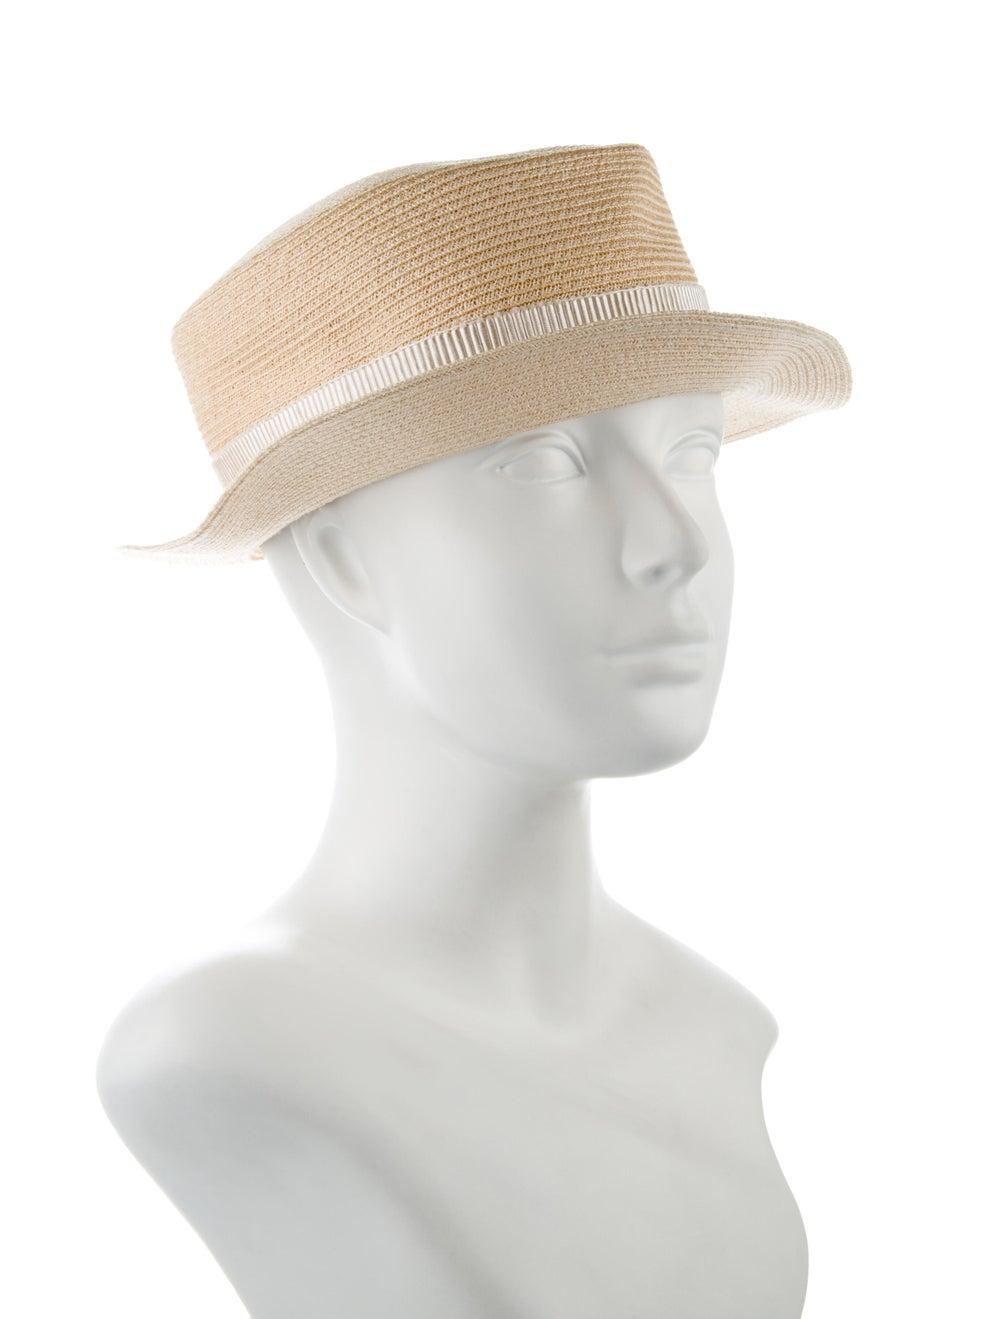 Maison Michel Straw Wide Brim Hat Tan - image 3